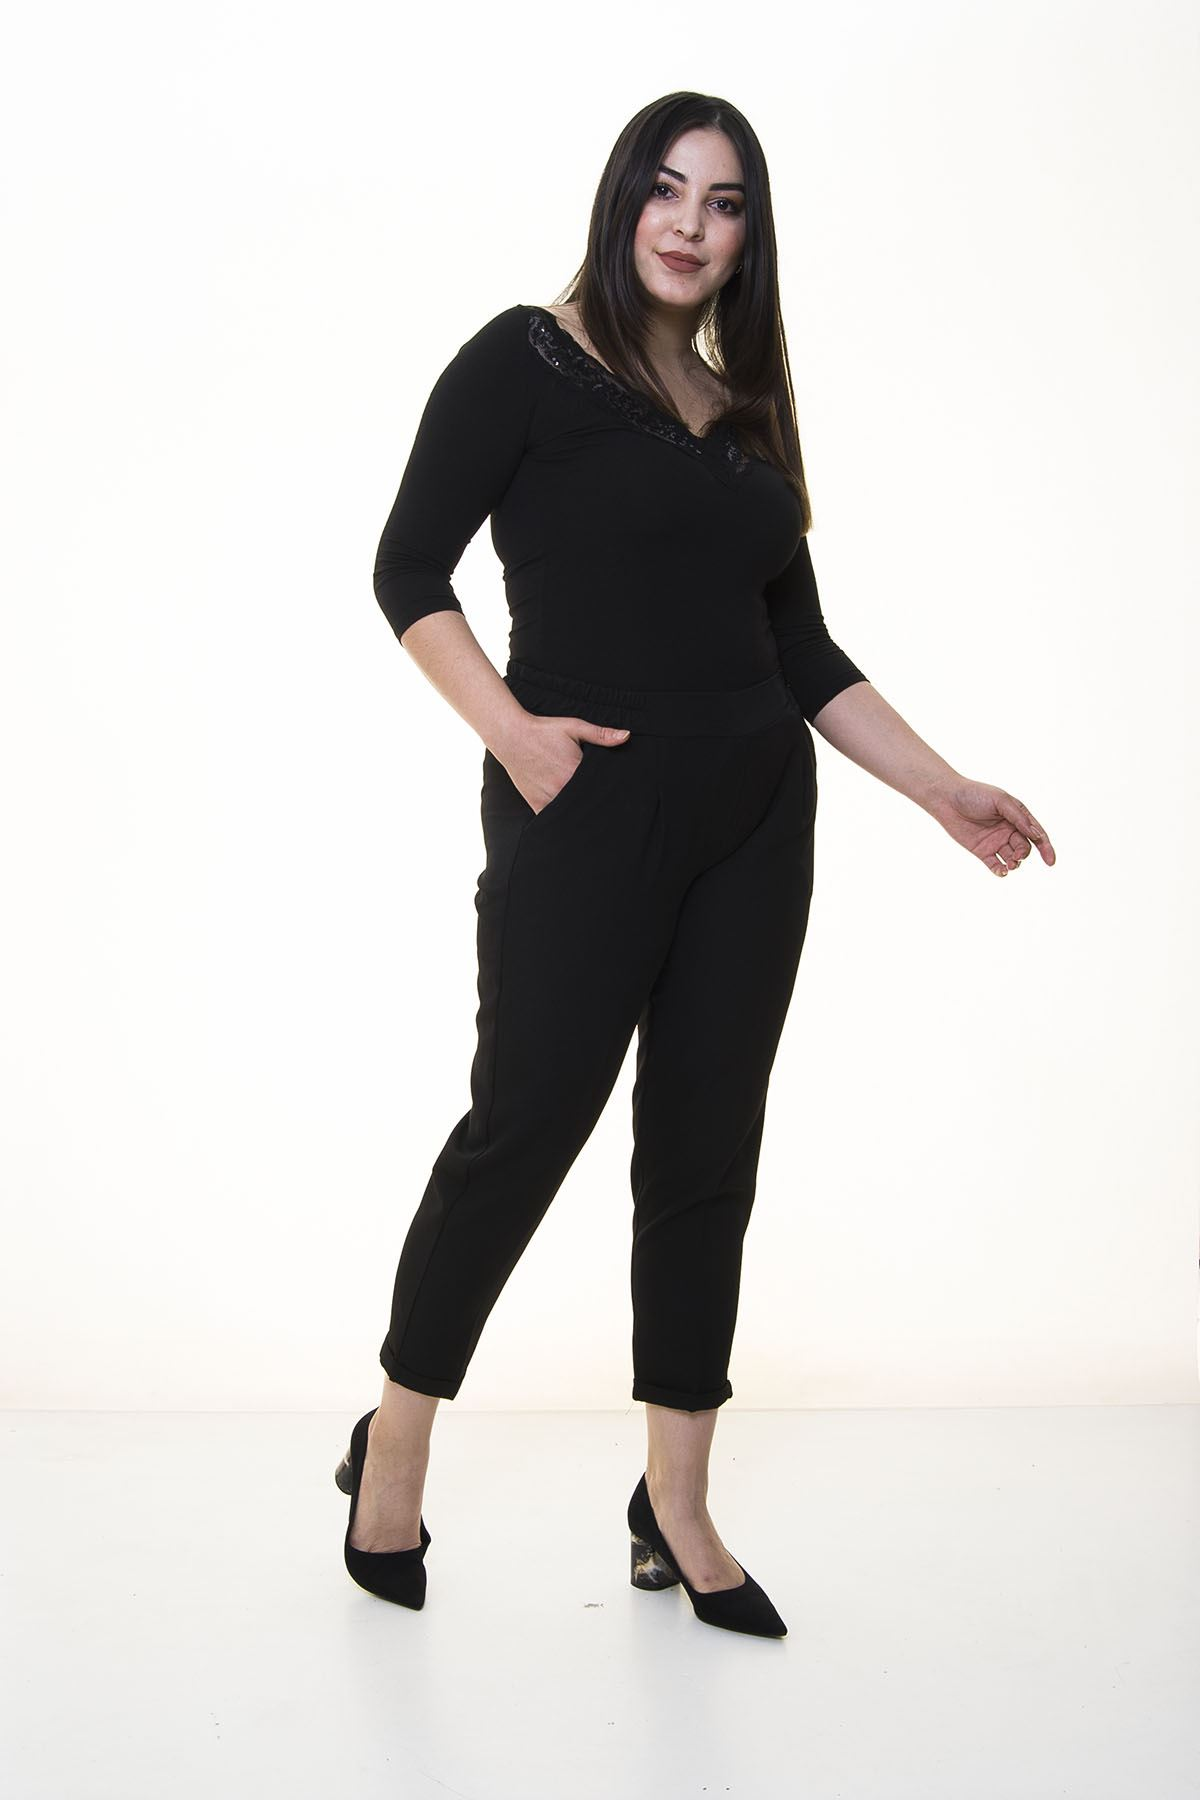 Siyah Duble Paça Kumaş Pantolon 34C-1376